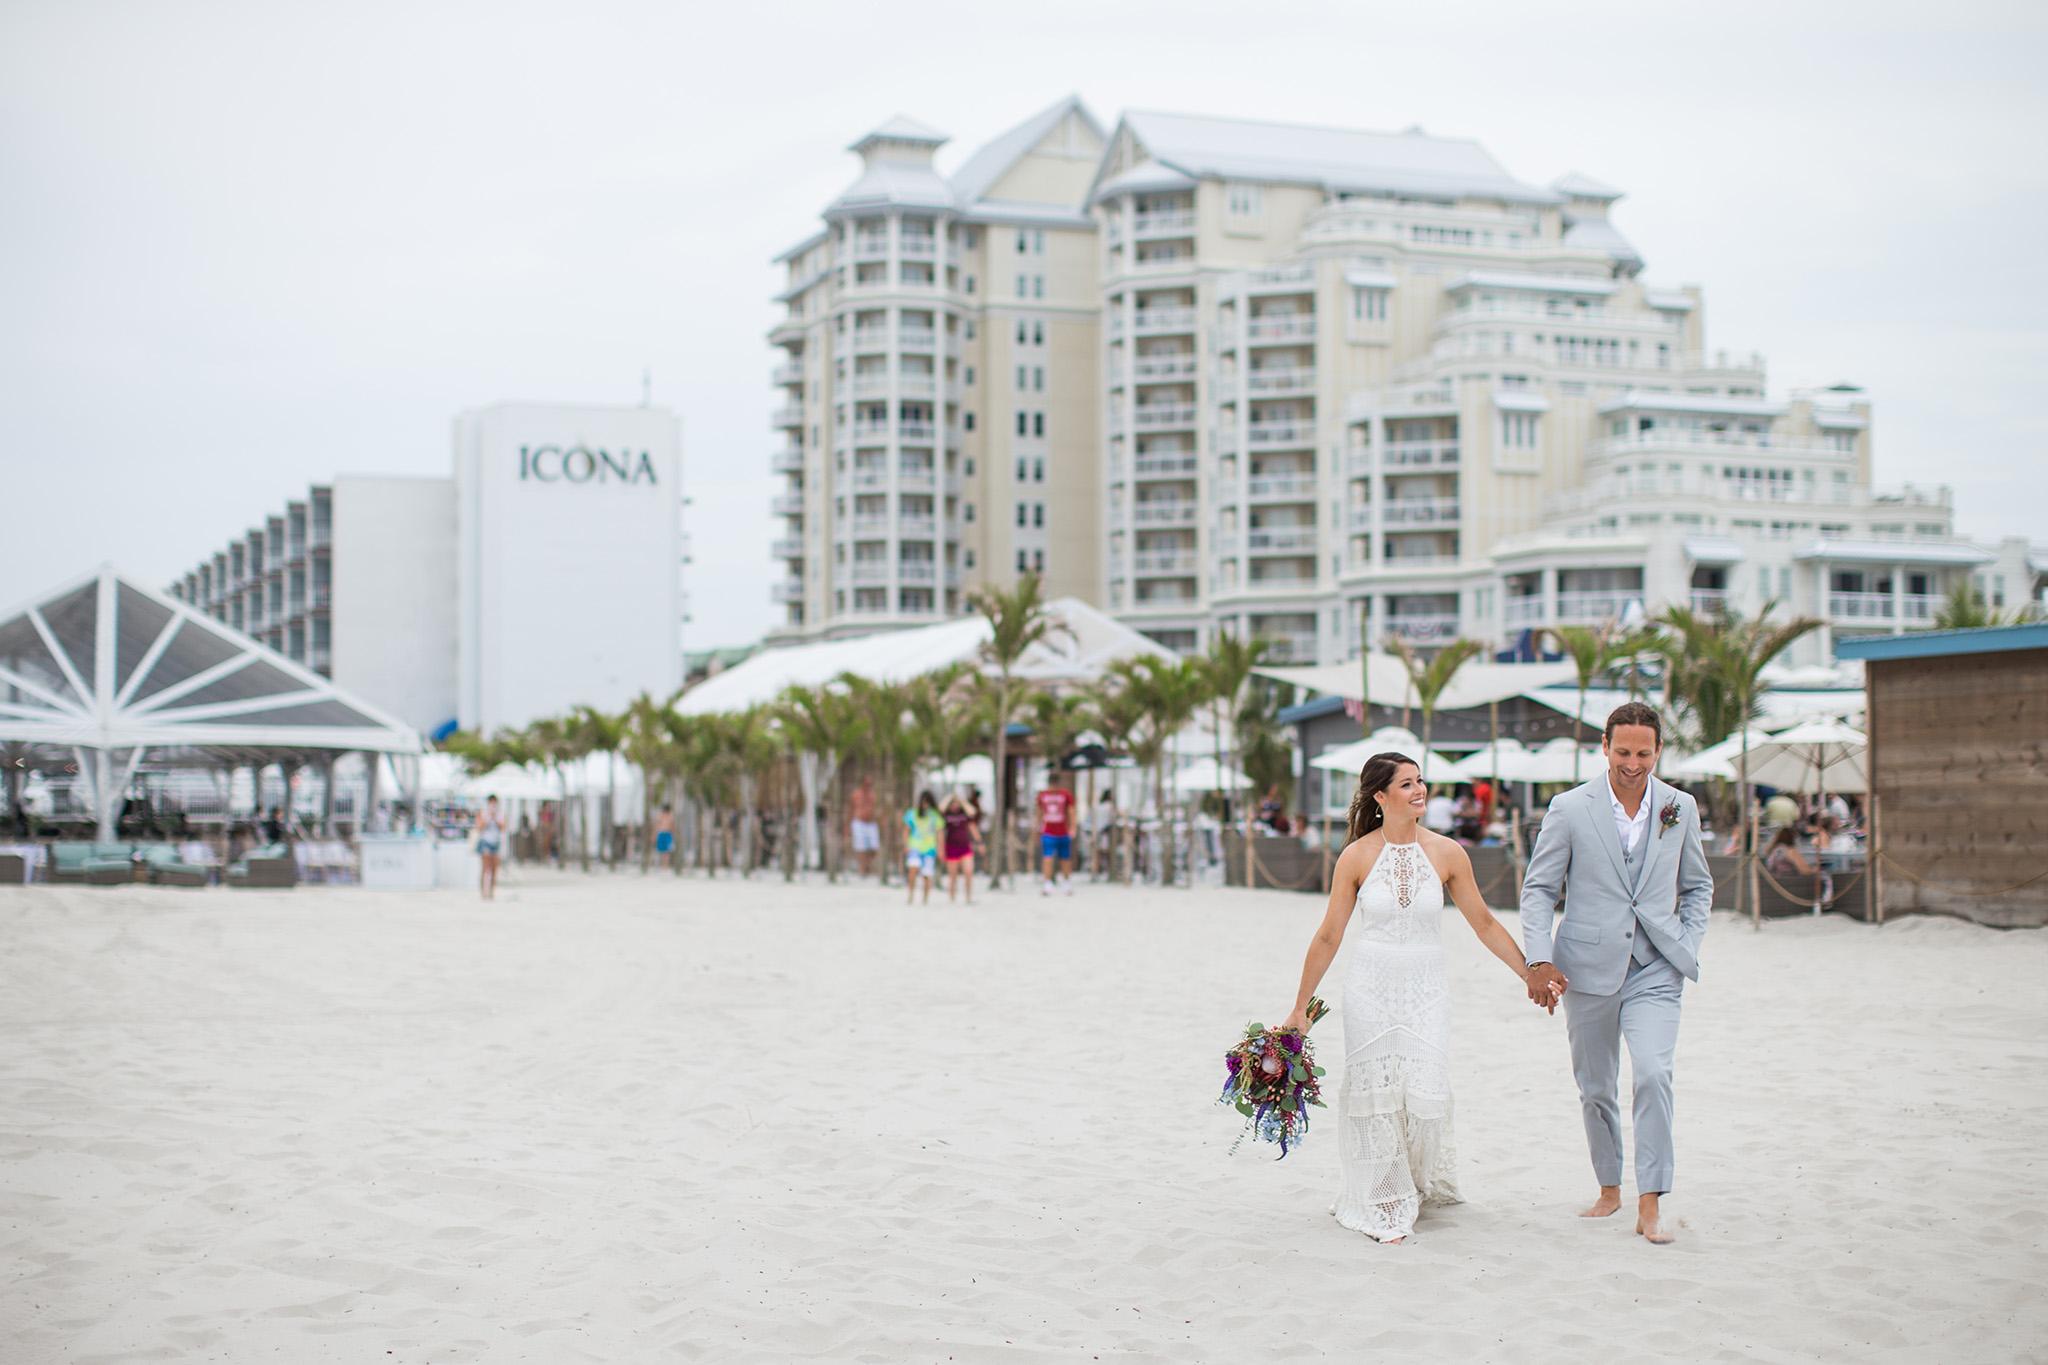 icona_diamond_beach_wedding_24.jpg